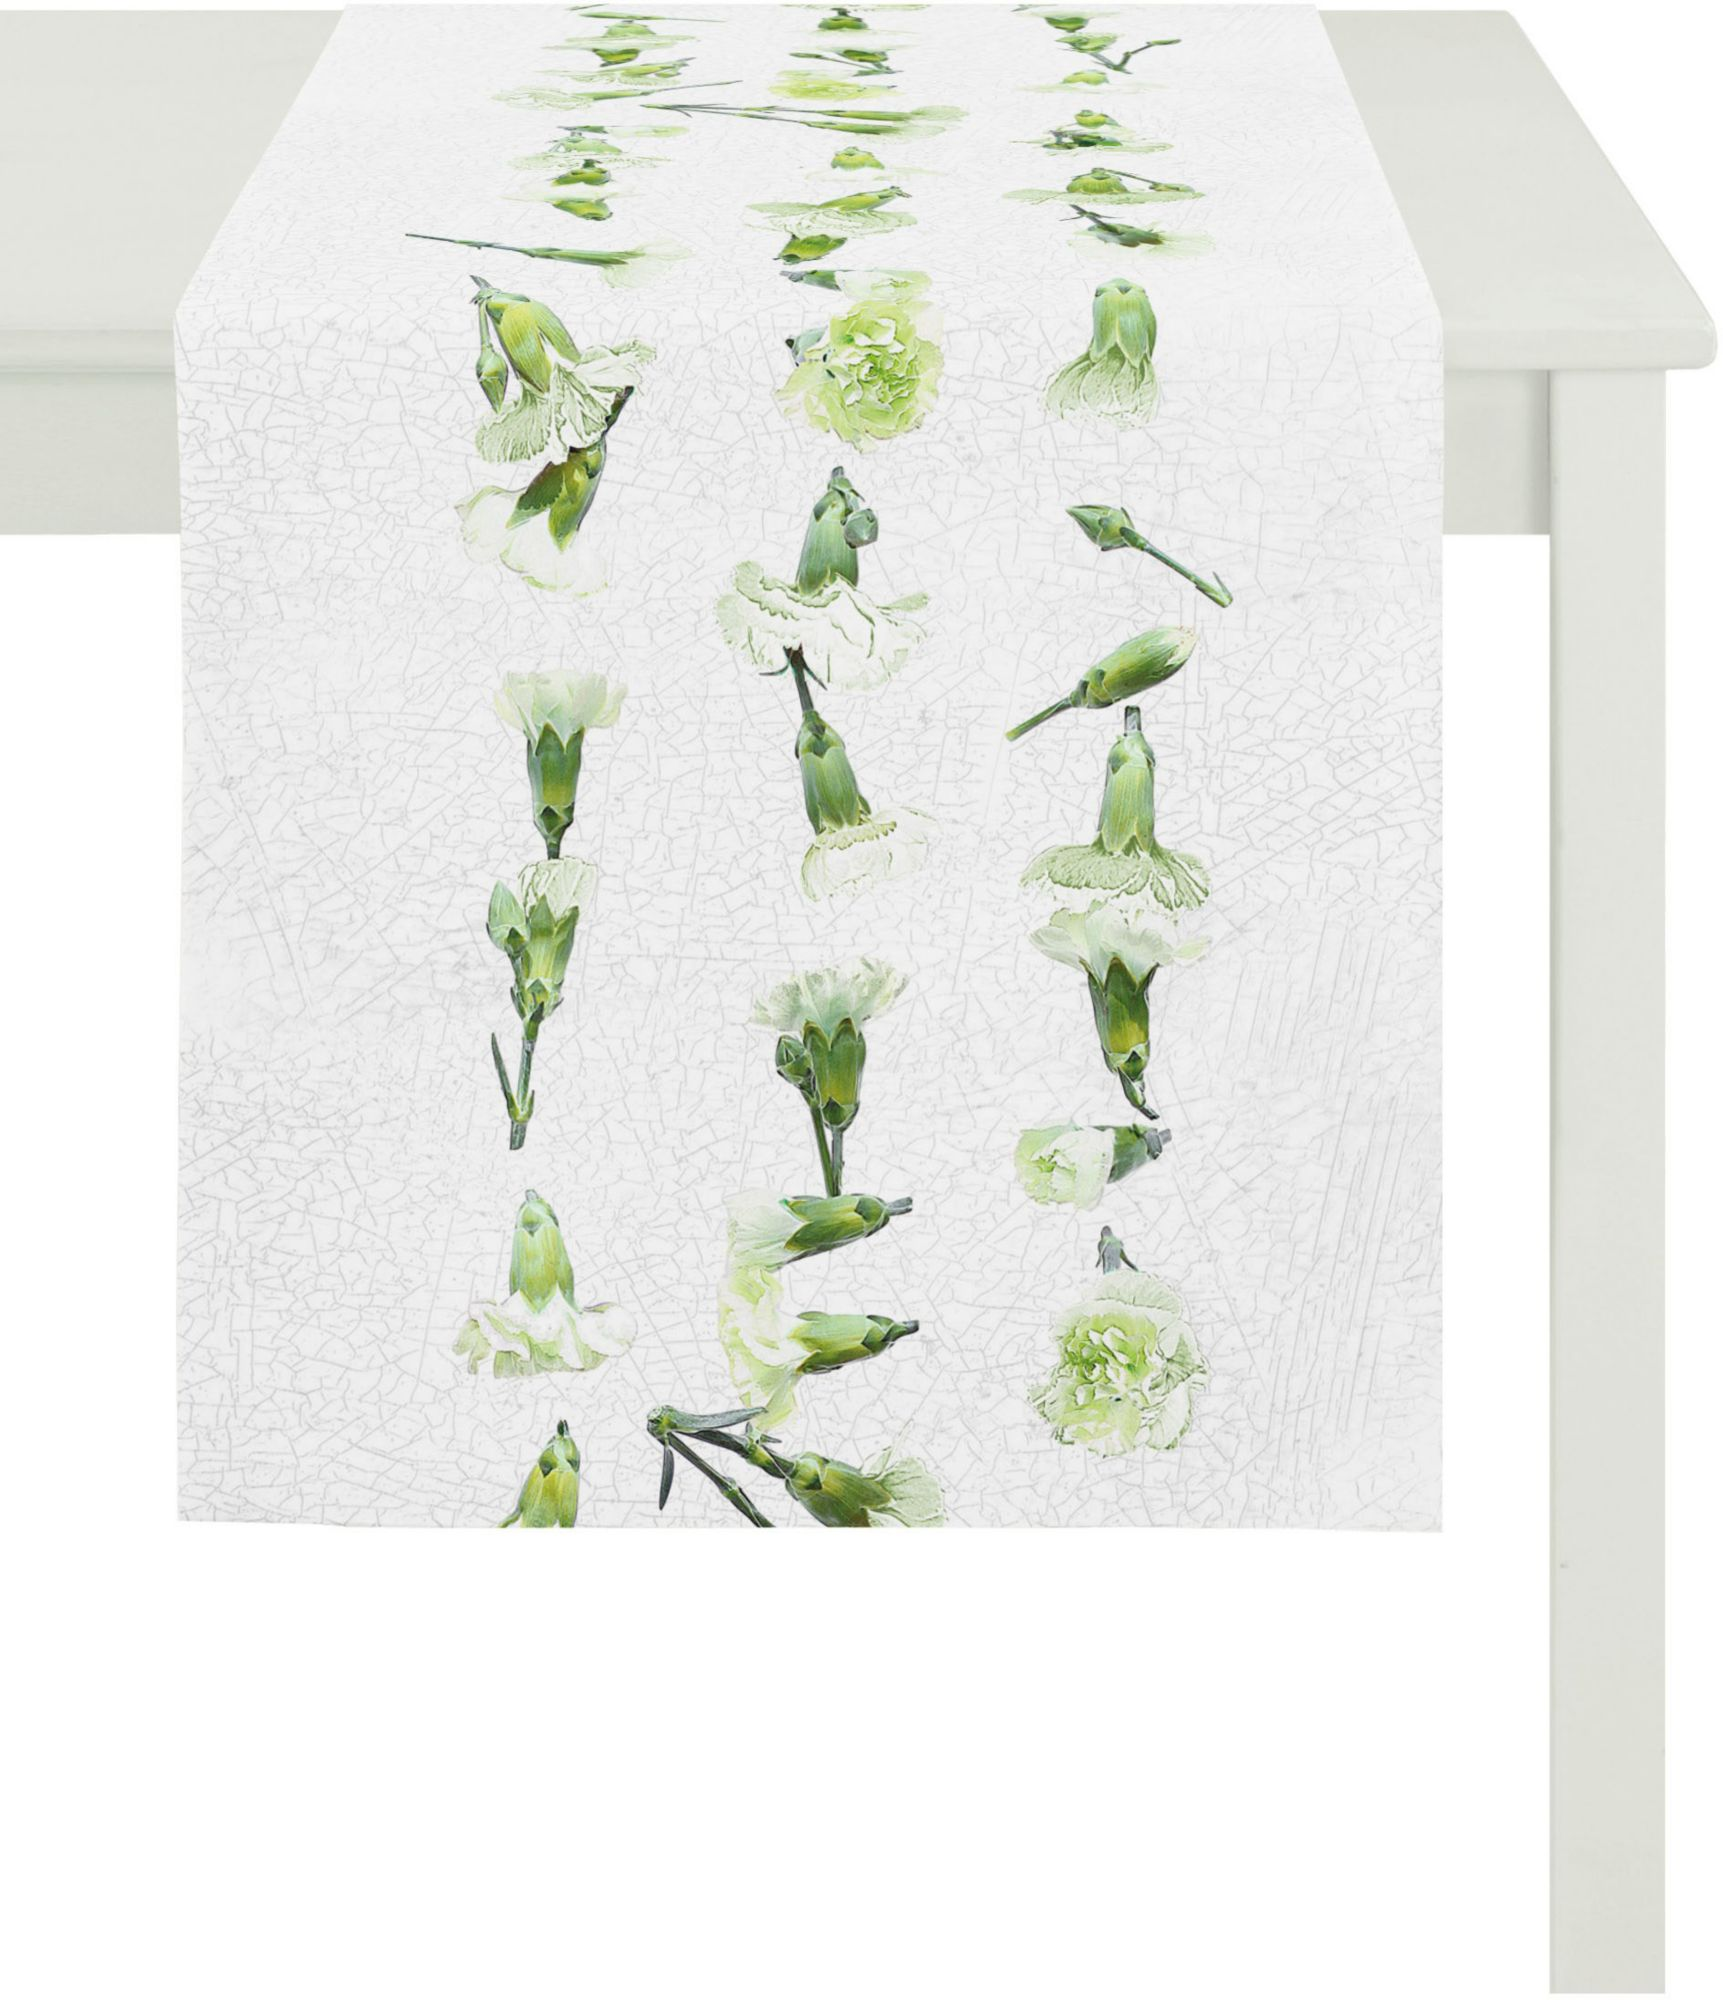 APELT Apelt Tischläufer, 40x140 cm, »3941 SUMMER GARDEN«